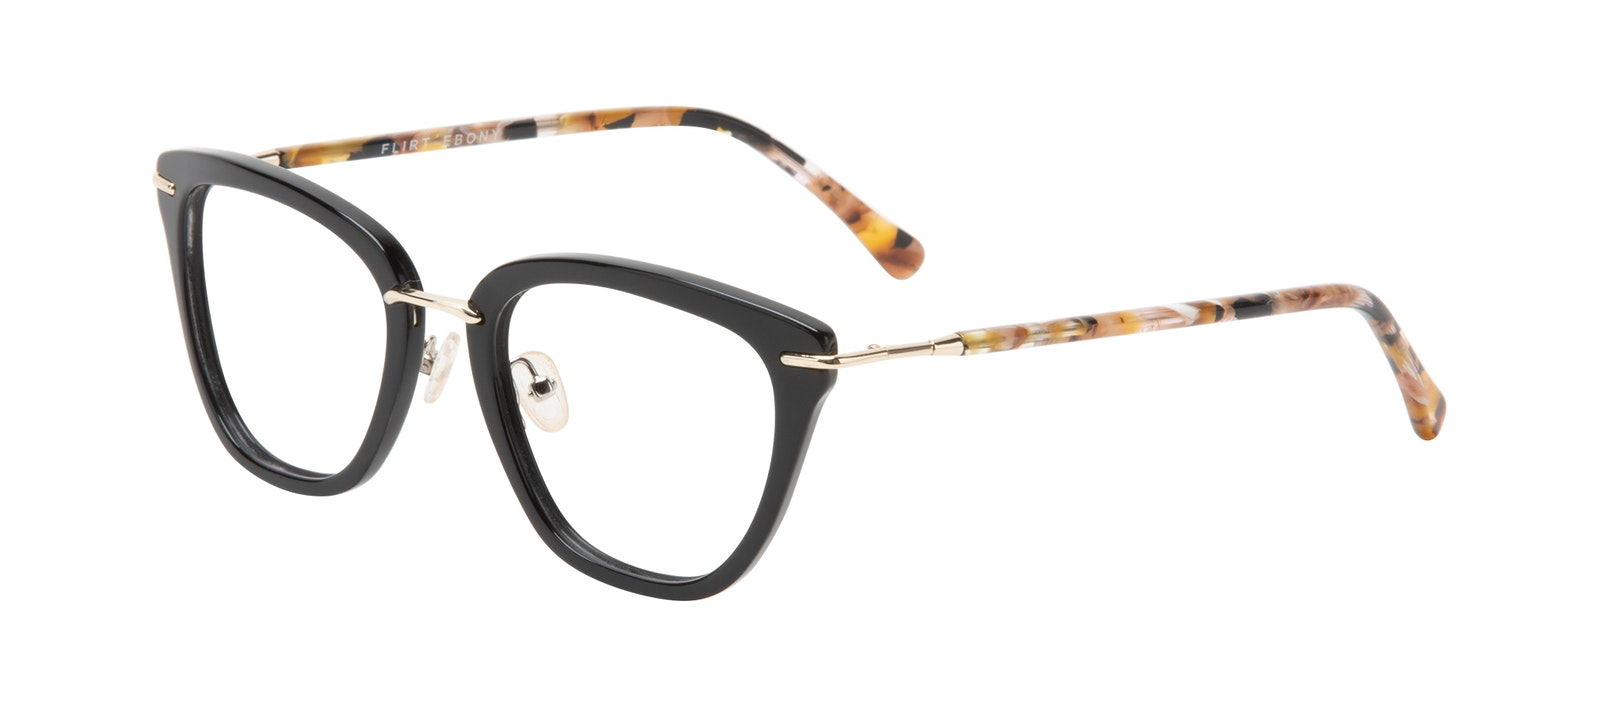 e44f394077b1 Affordable Fashion Glasses Square Eyeglasses Women Flirt Ebony Tilt